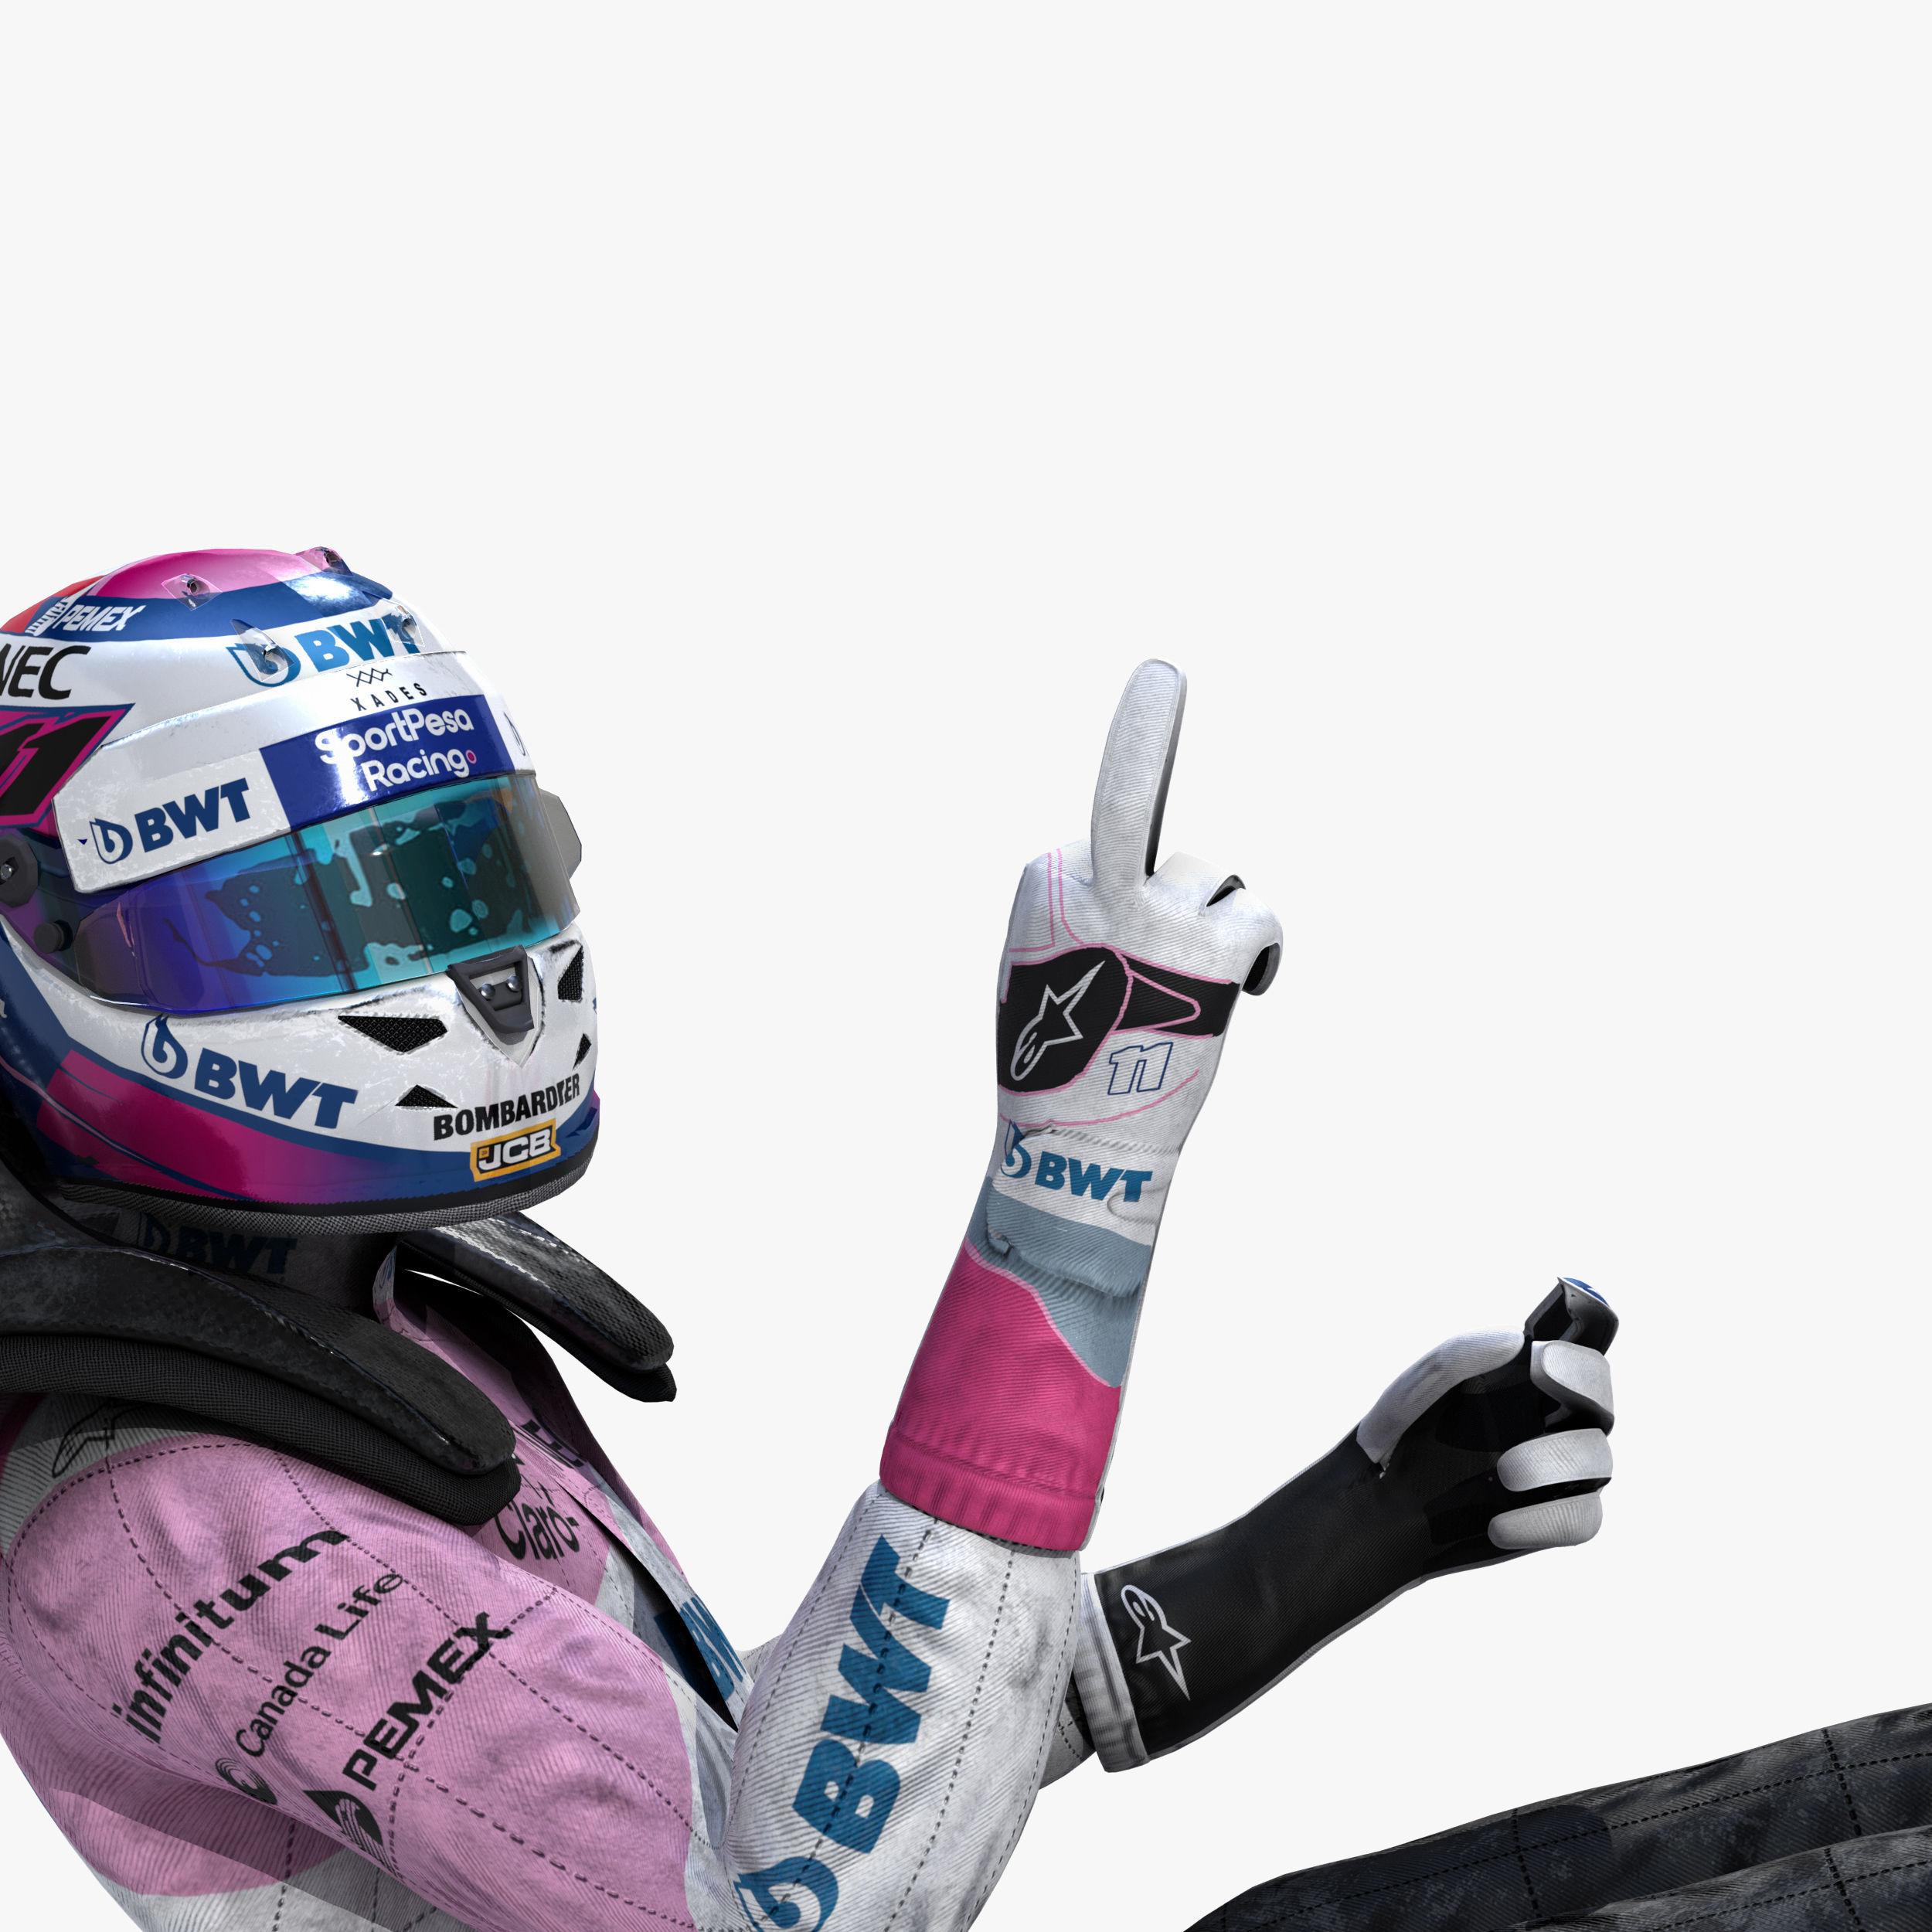 Sergio Perez 2019